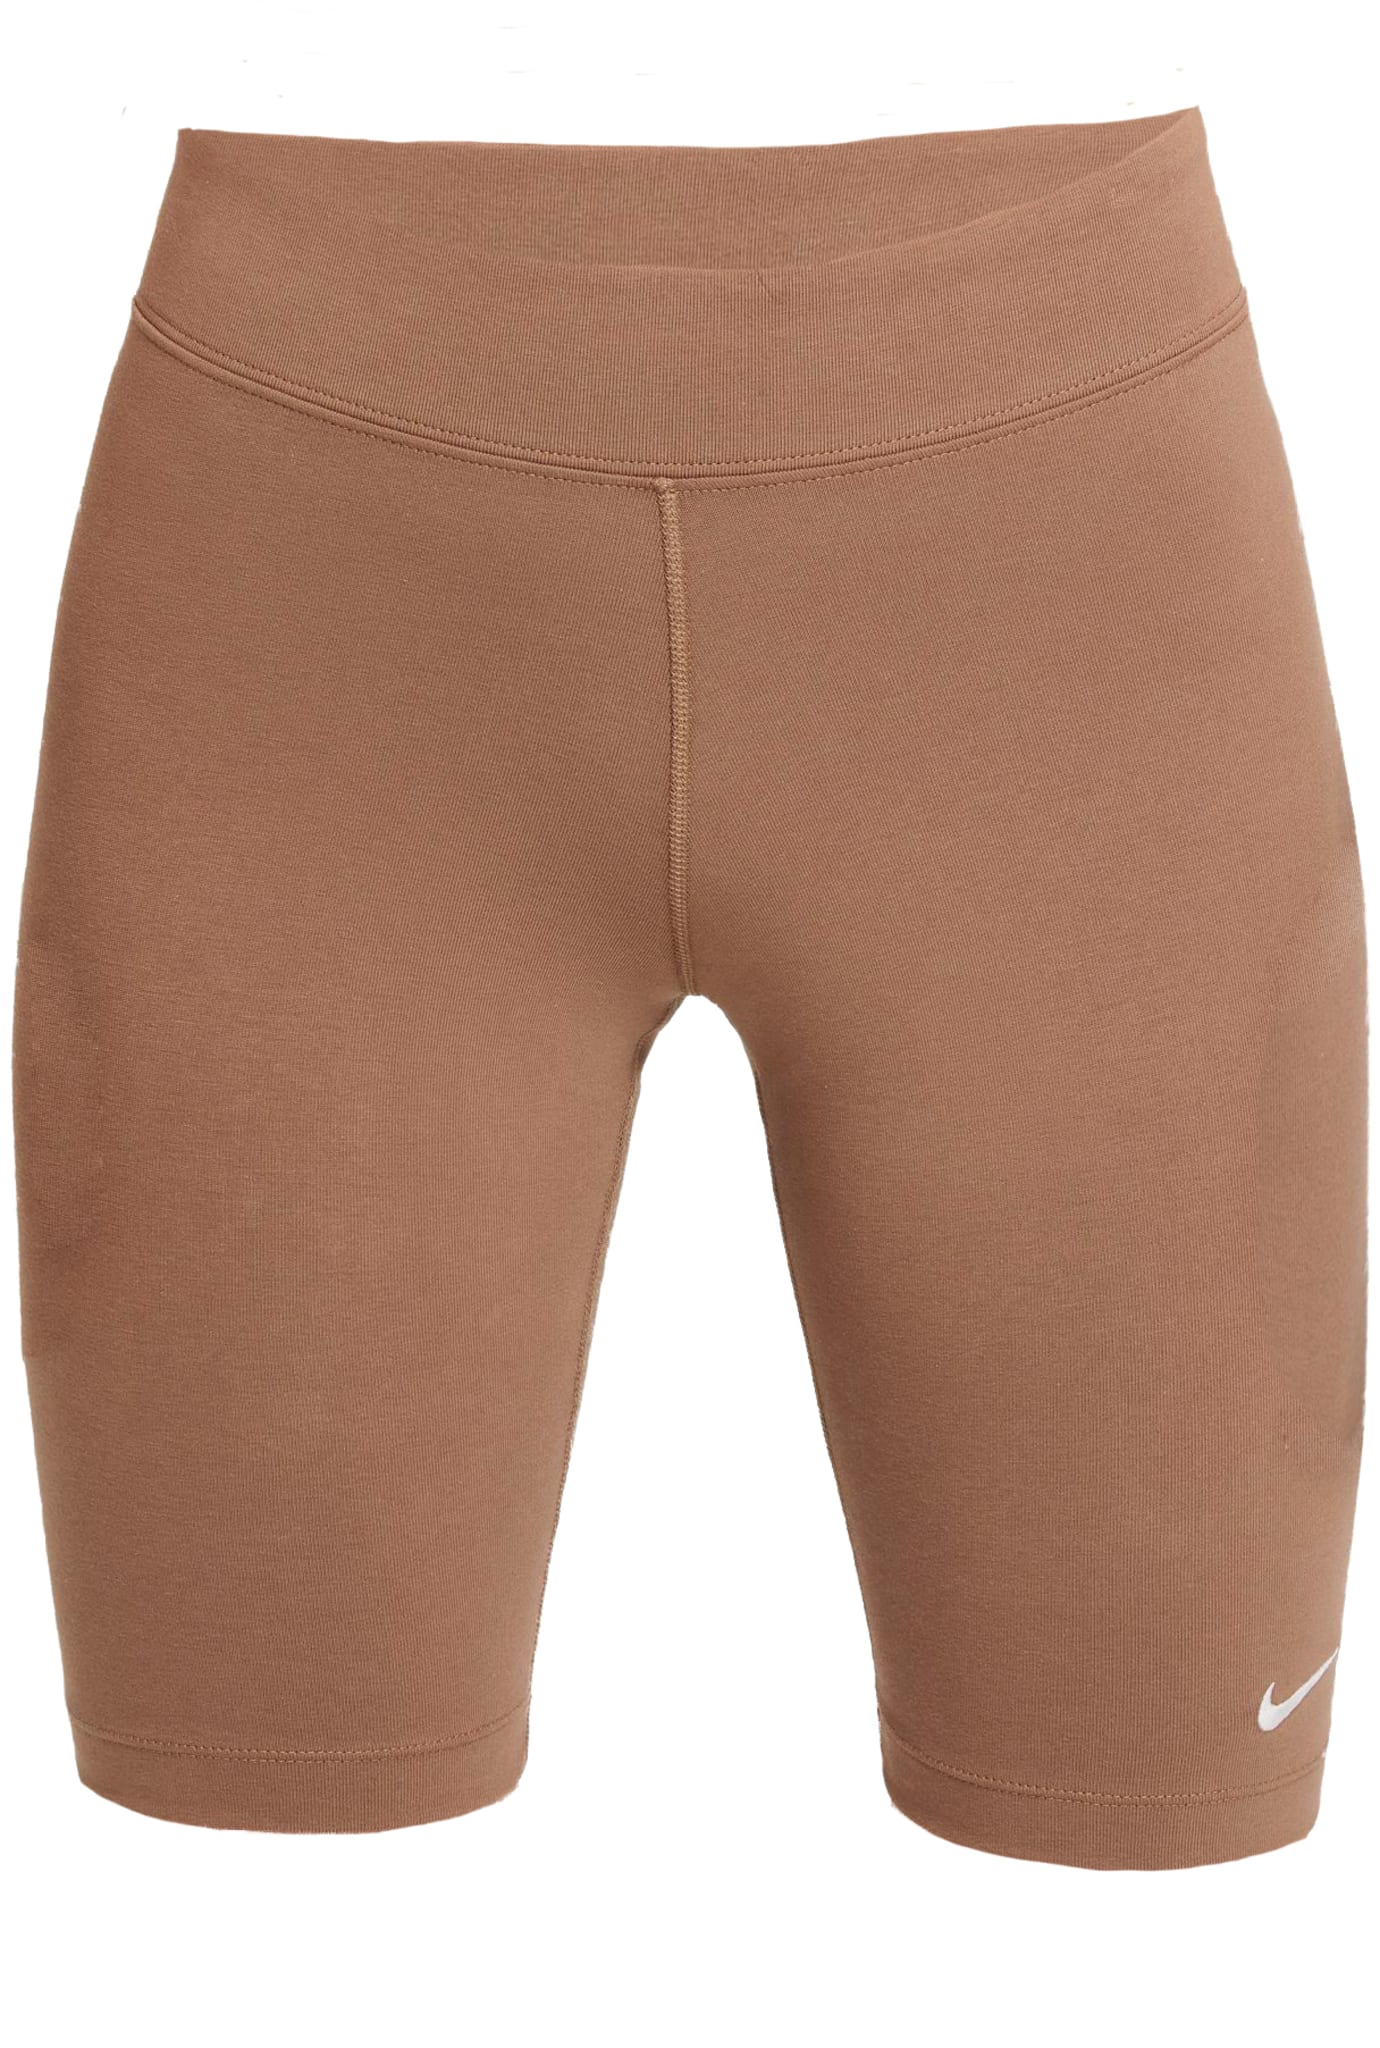 Sportswear Essential Bike Shorts W